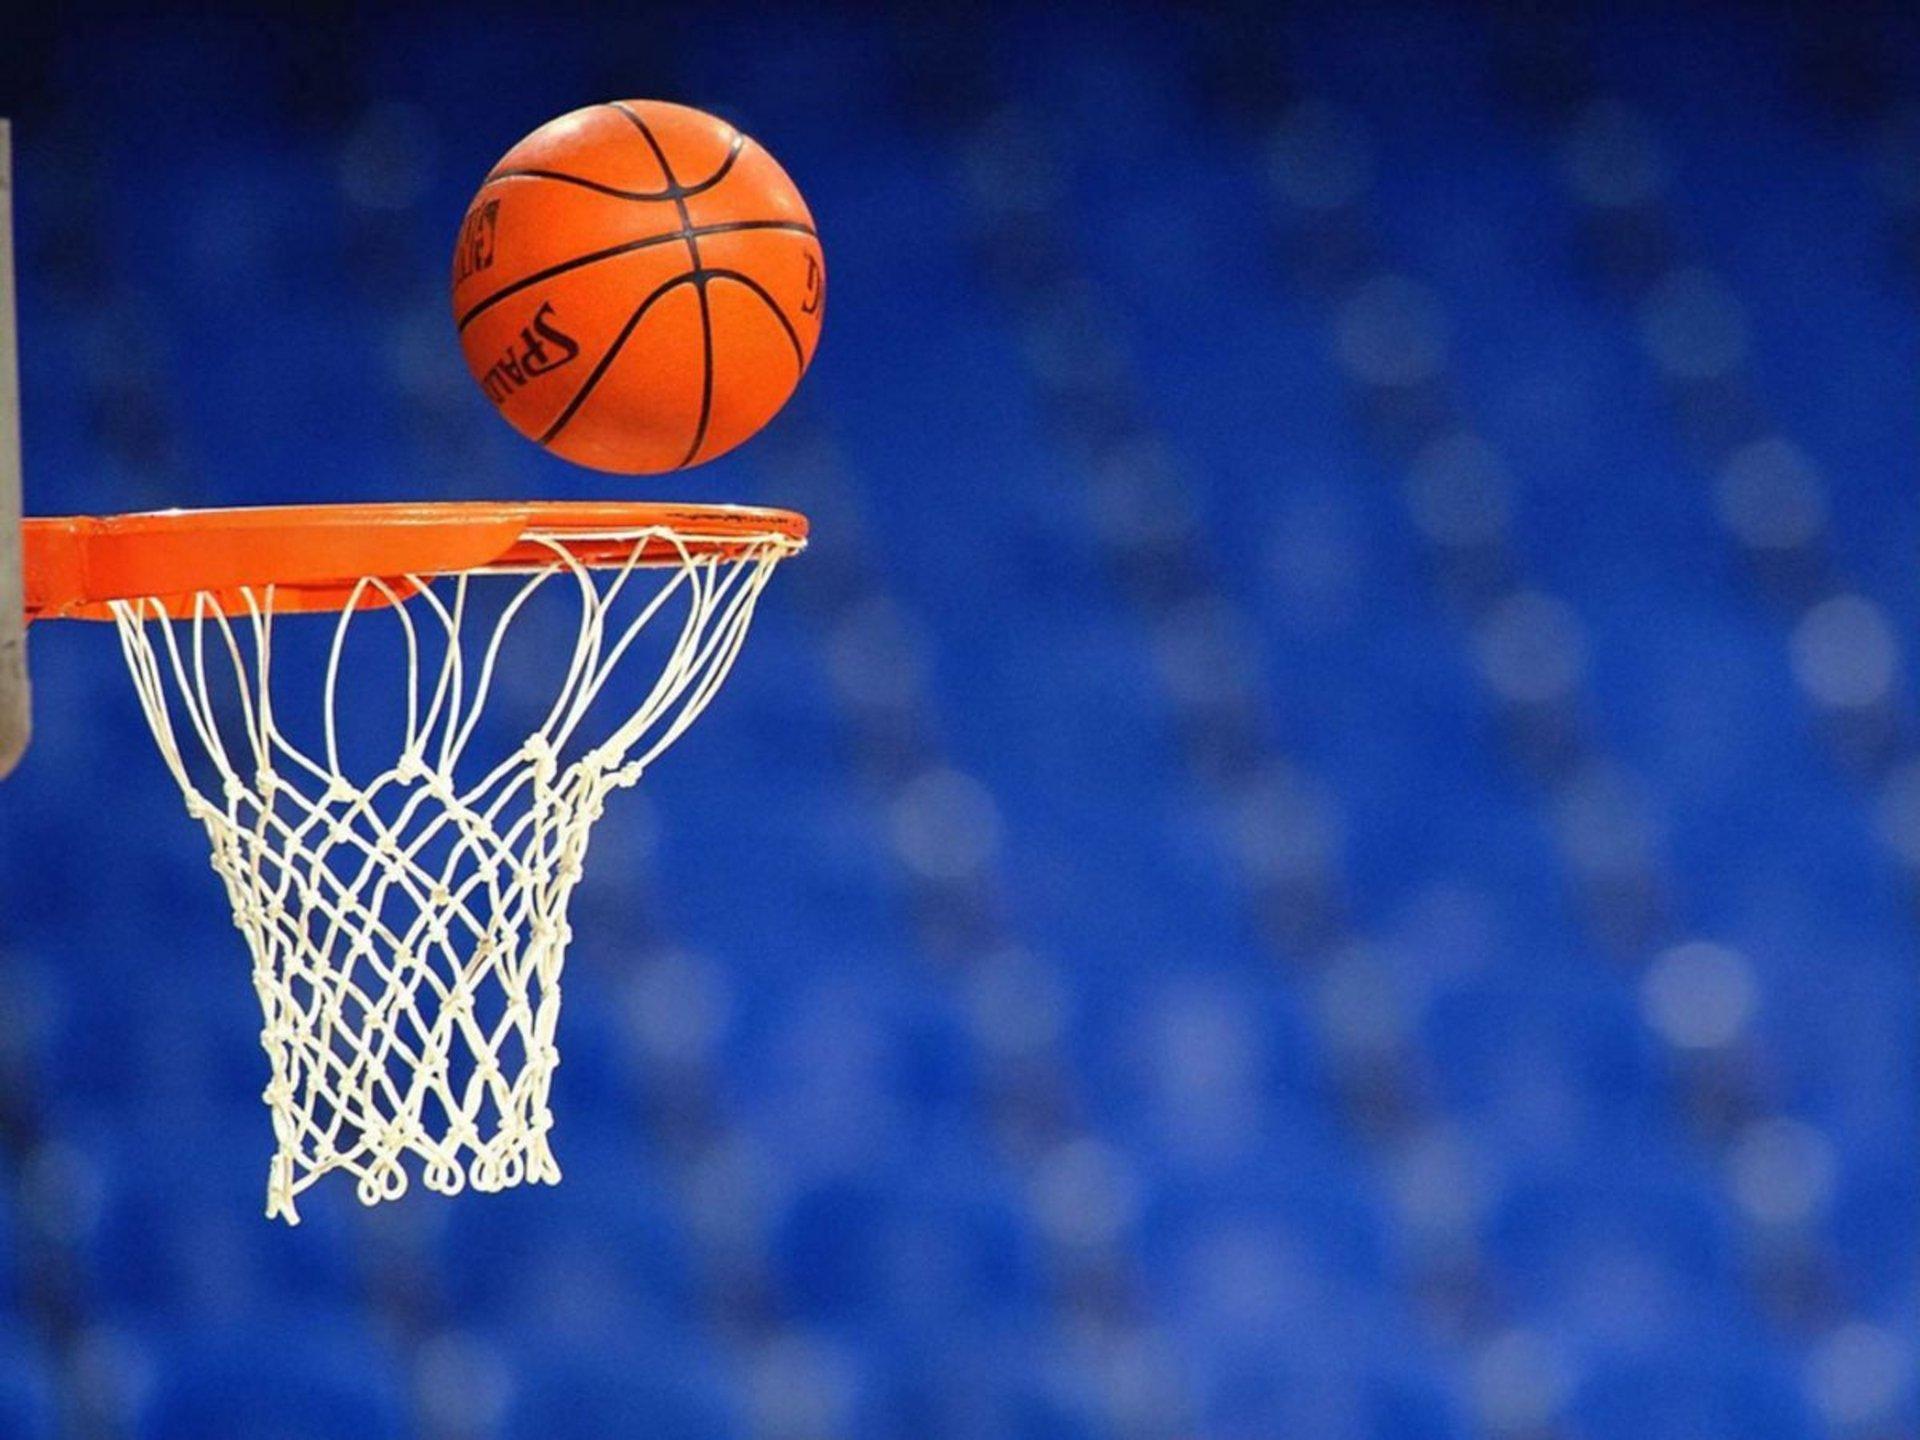 Баскетбол. Ставки на НБА. Баскетбольные ставки 13 Ноября